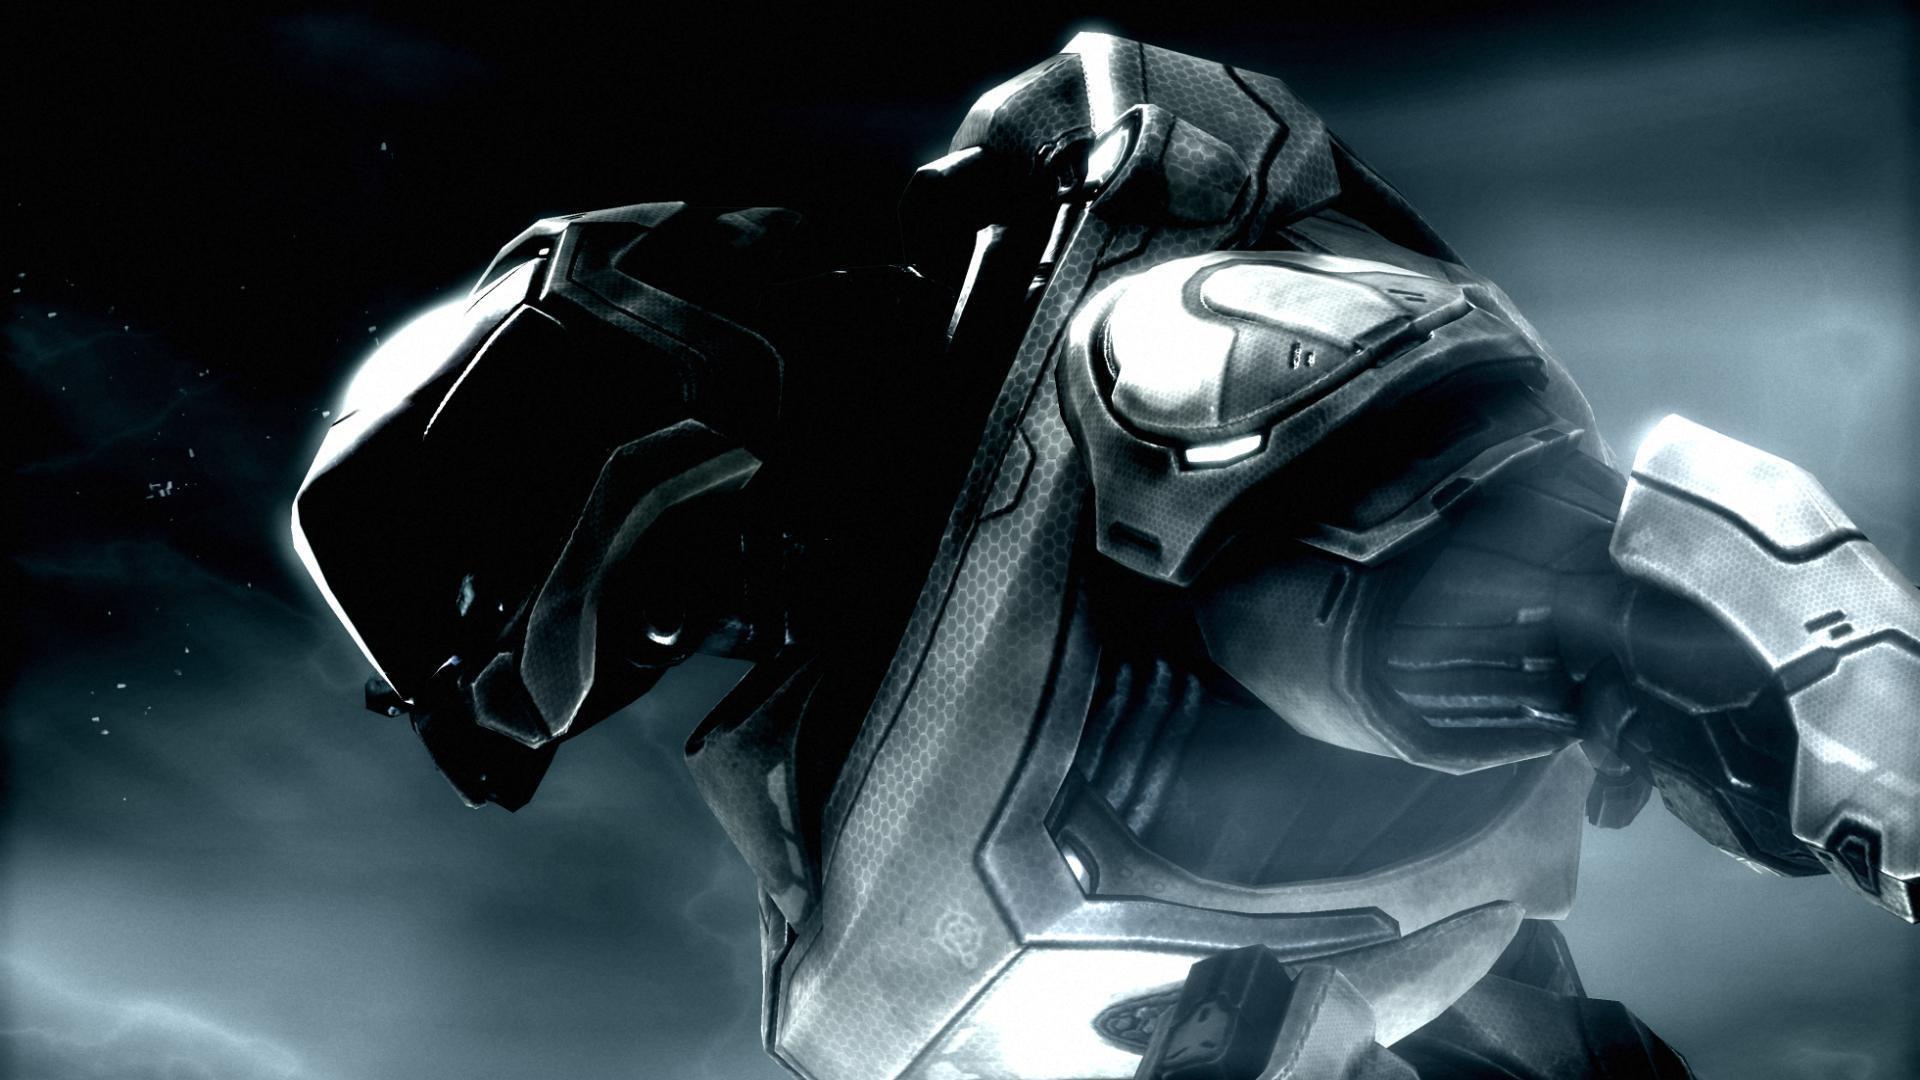 Halo Elite Wallpaper 74 images 1920x1080